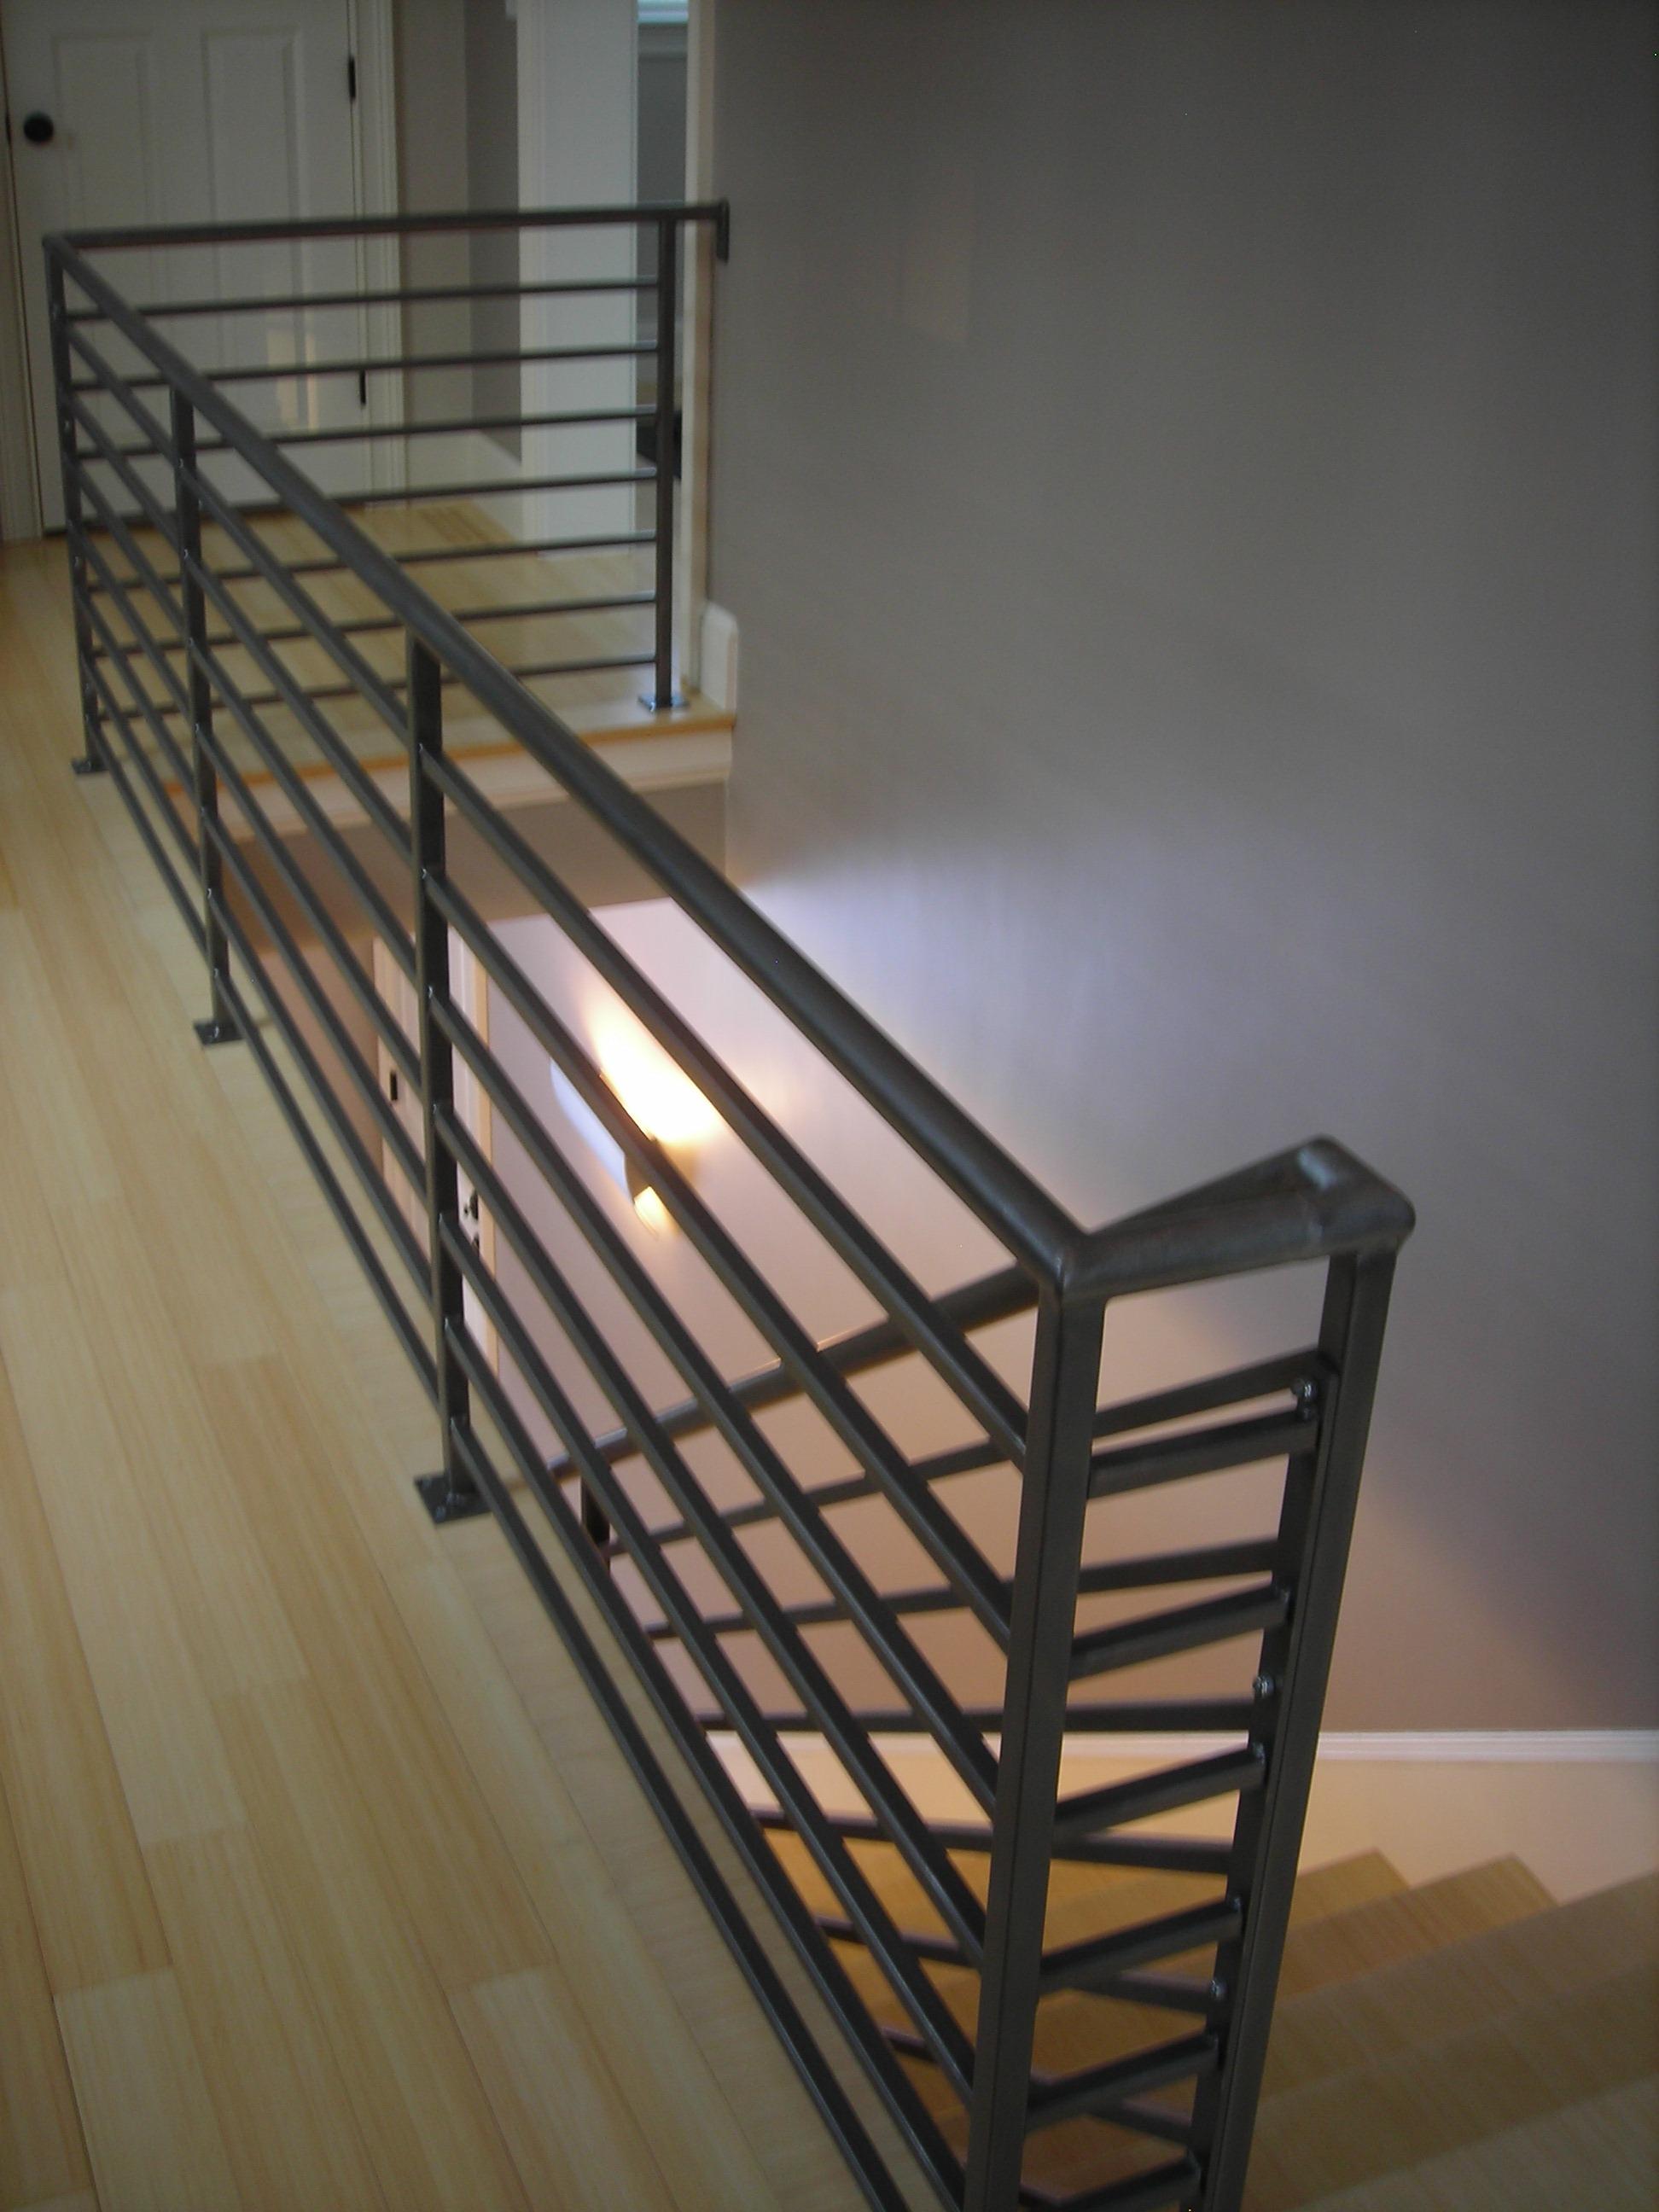 Custom Horizontal-Bar Steel Railing, with a Clear Coat Finish.